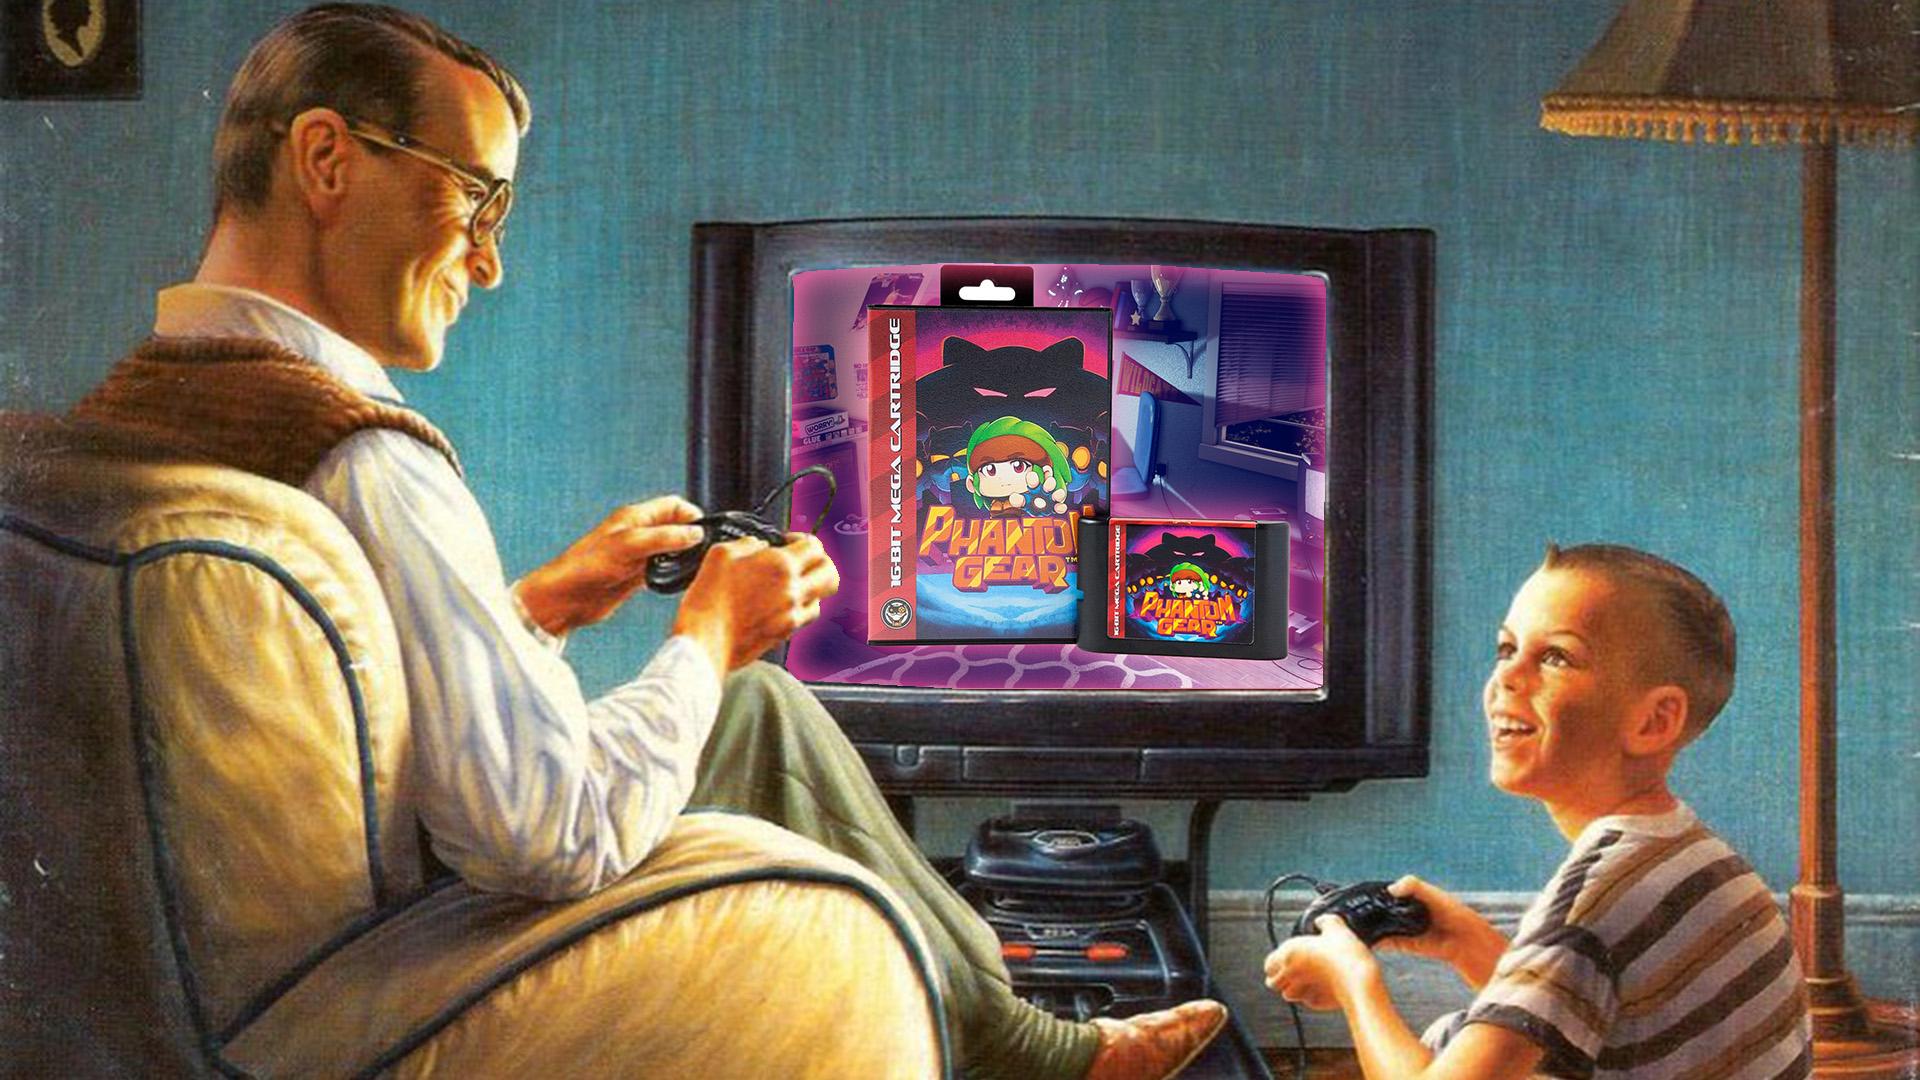 Contest: Win a physical Sega Genesis cartridge of Mega Cat Studios' Phantom Gear screenshot